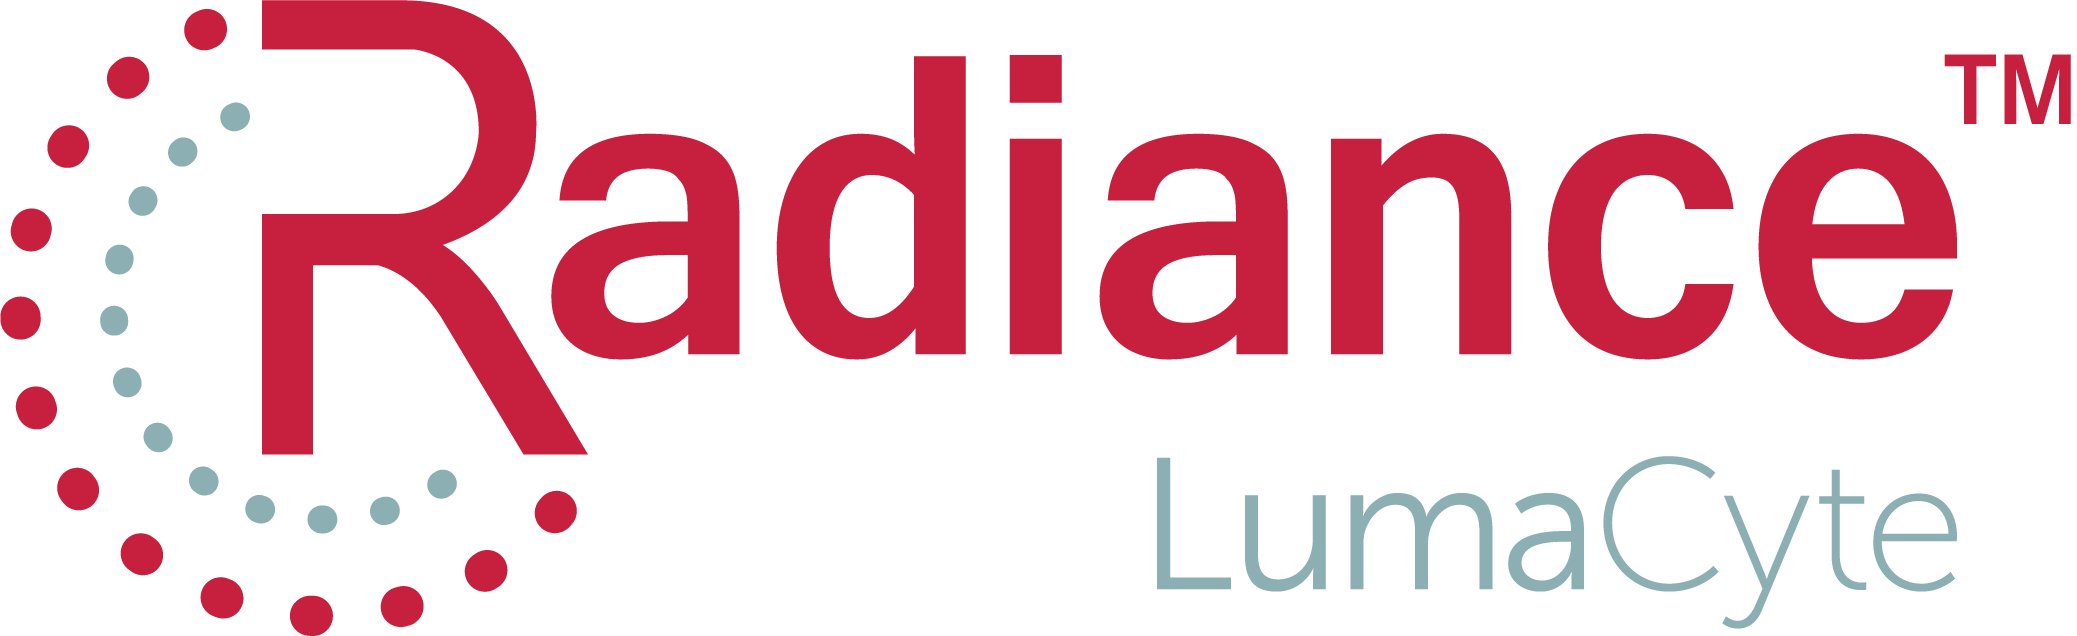 Radiance_logo.png